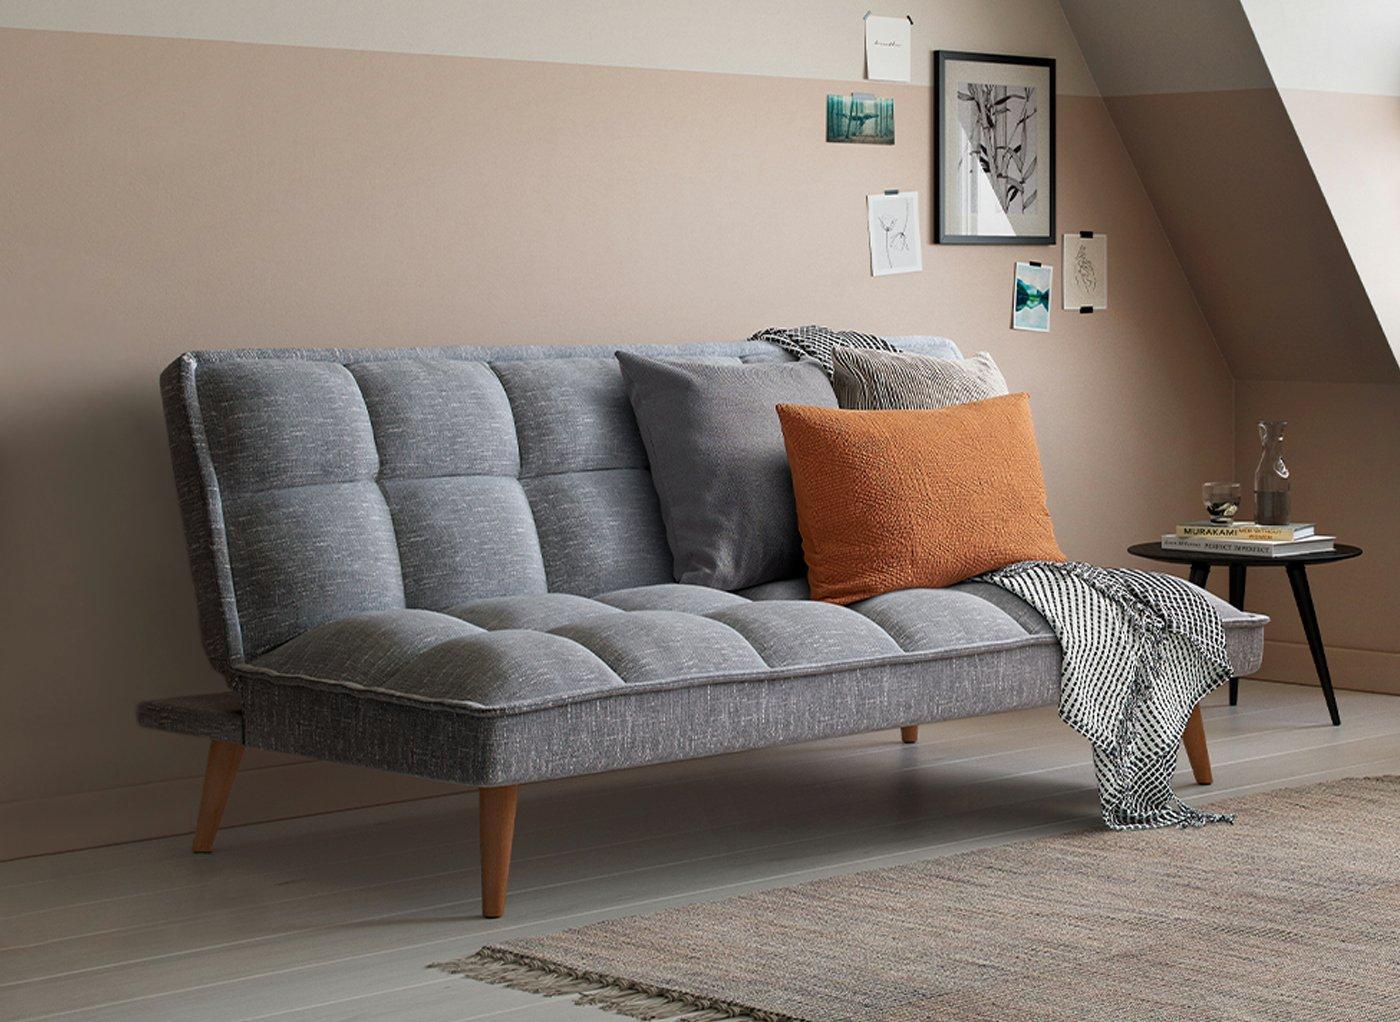 downpatrick-3-seater-clic-clac-sofa-bed